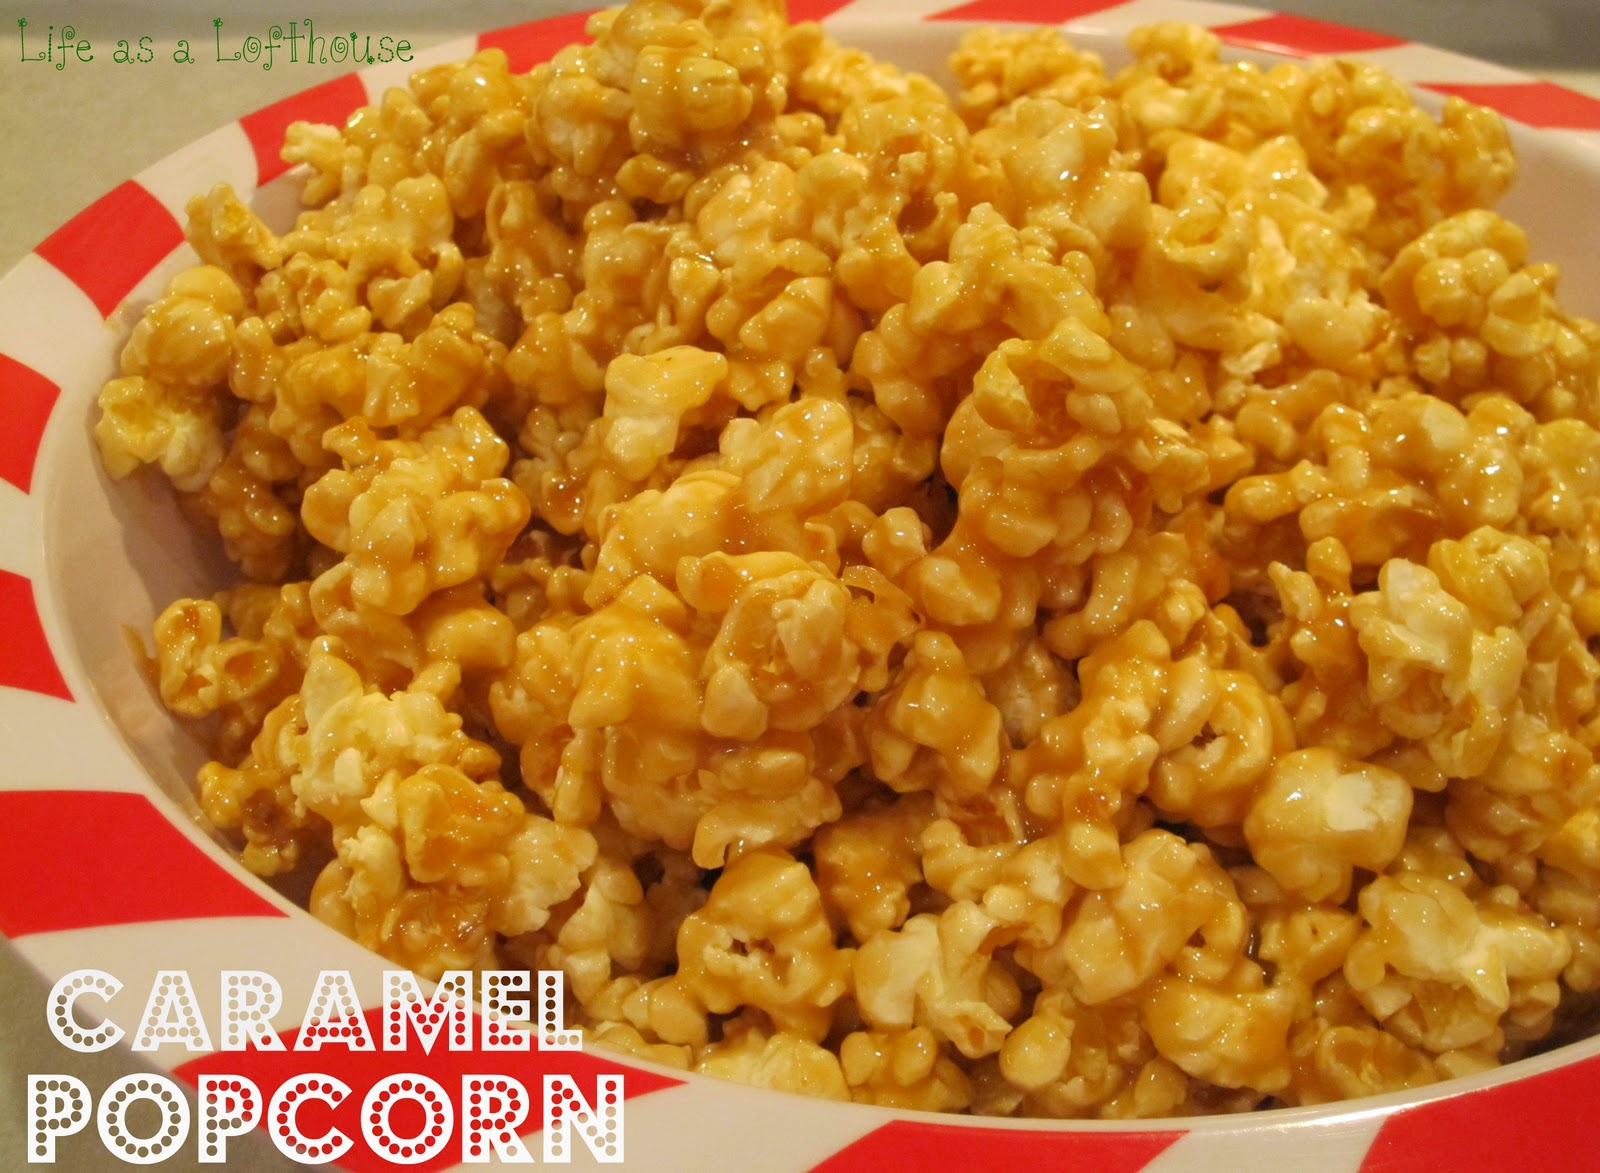 Spicy Cheese-Caramel Popcorn Recipes — Dishmaps